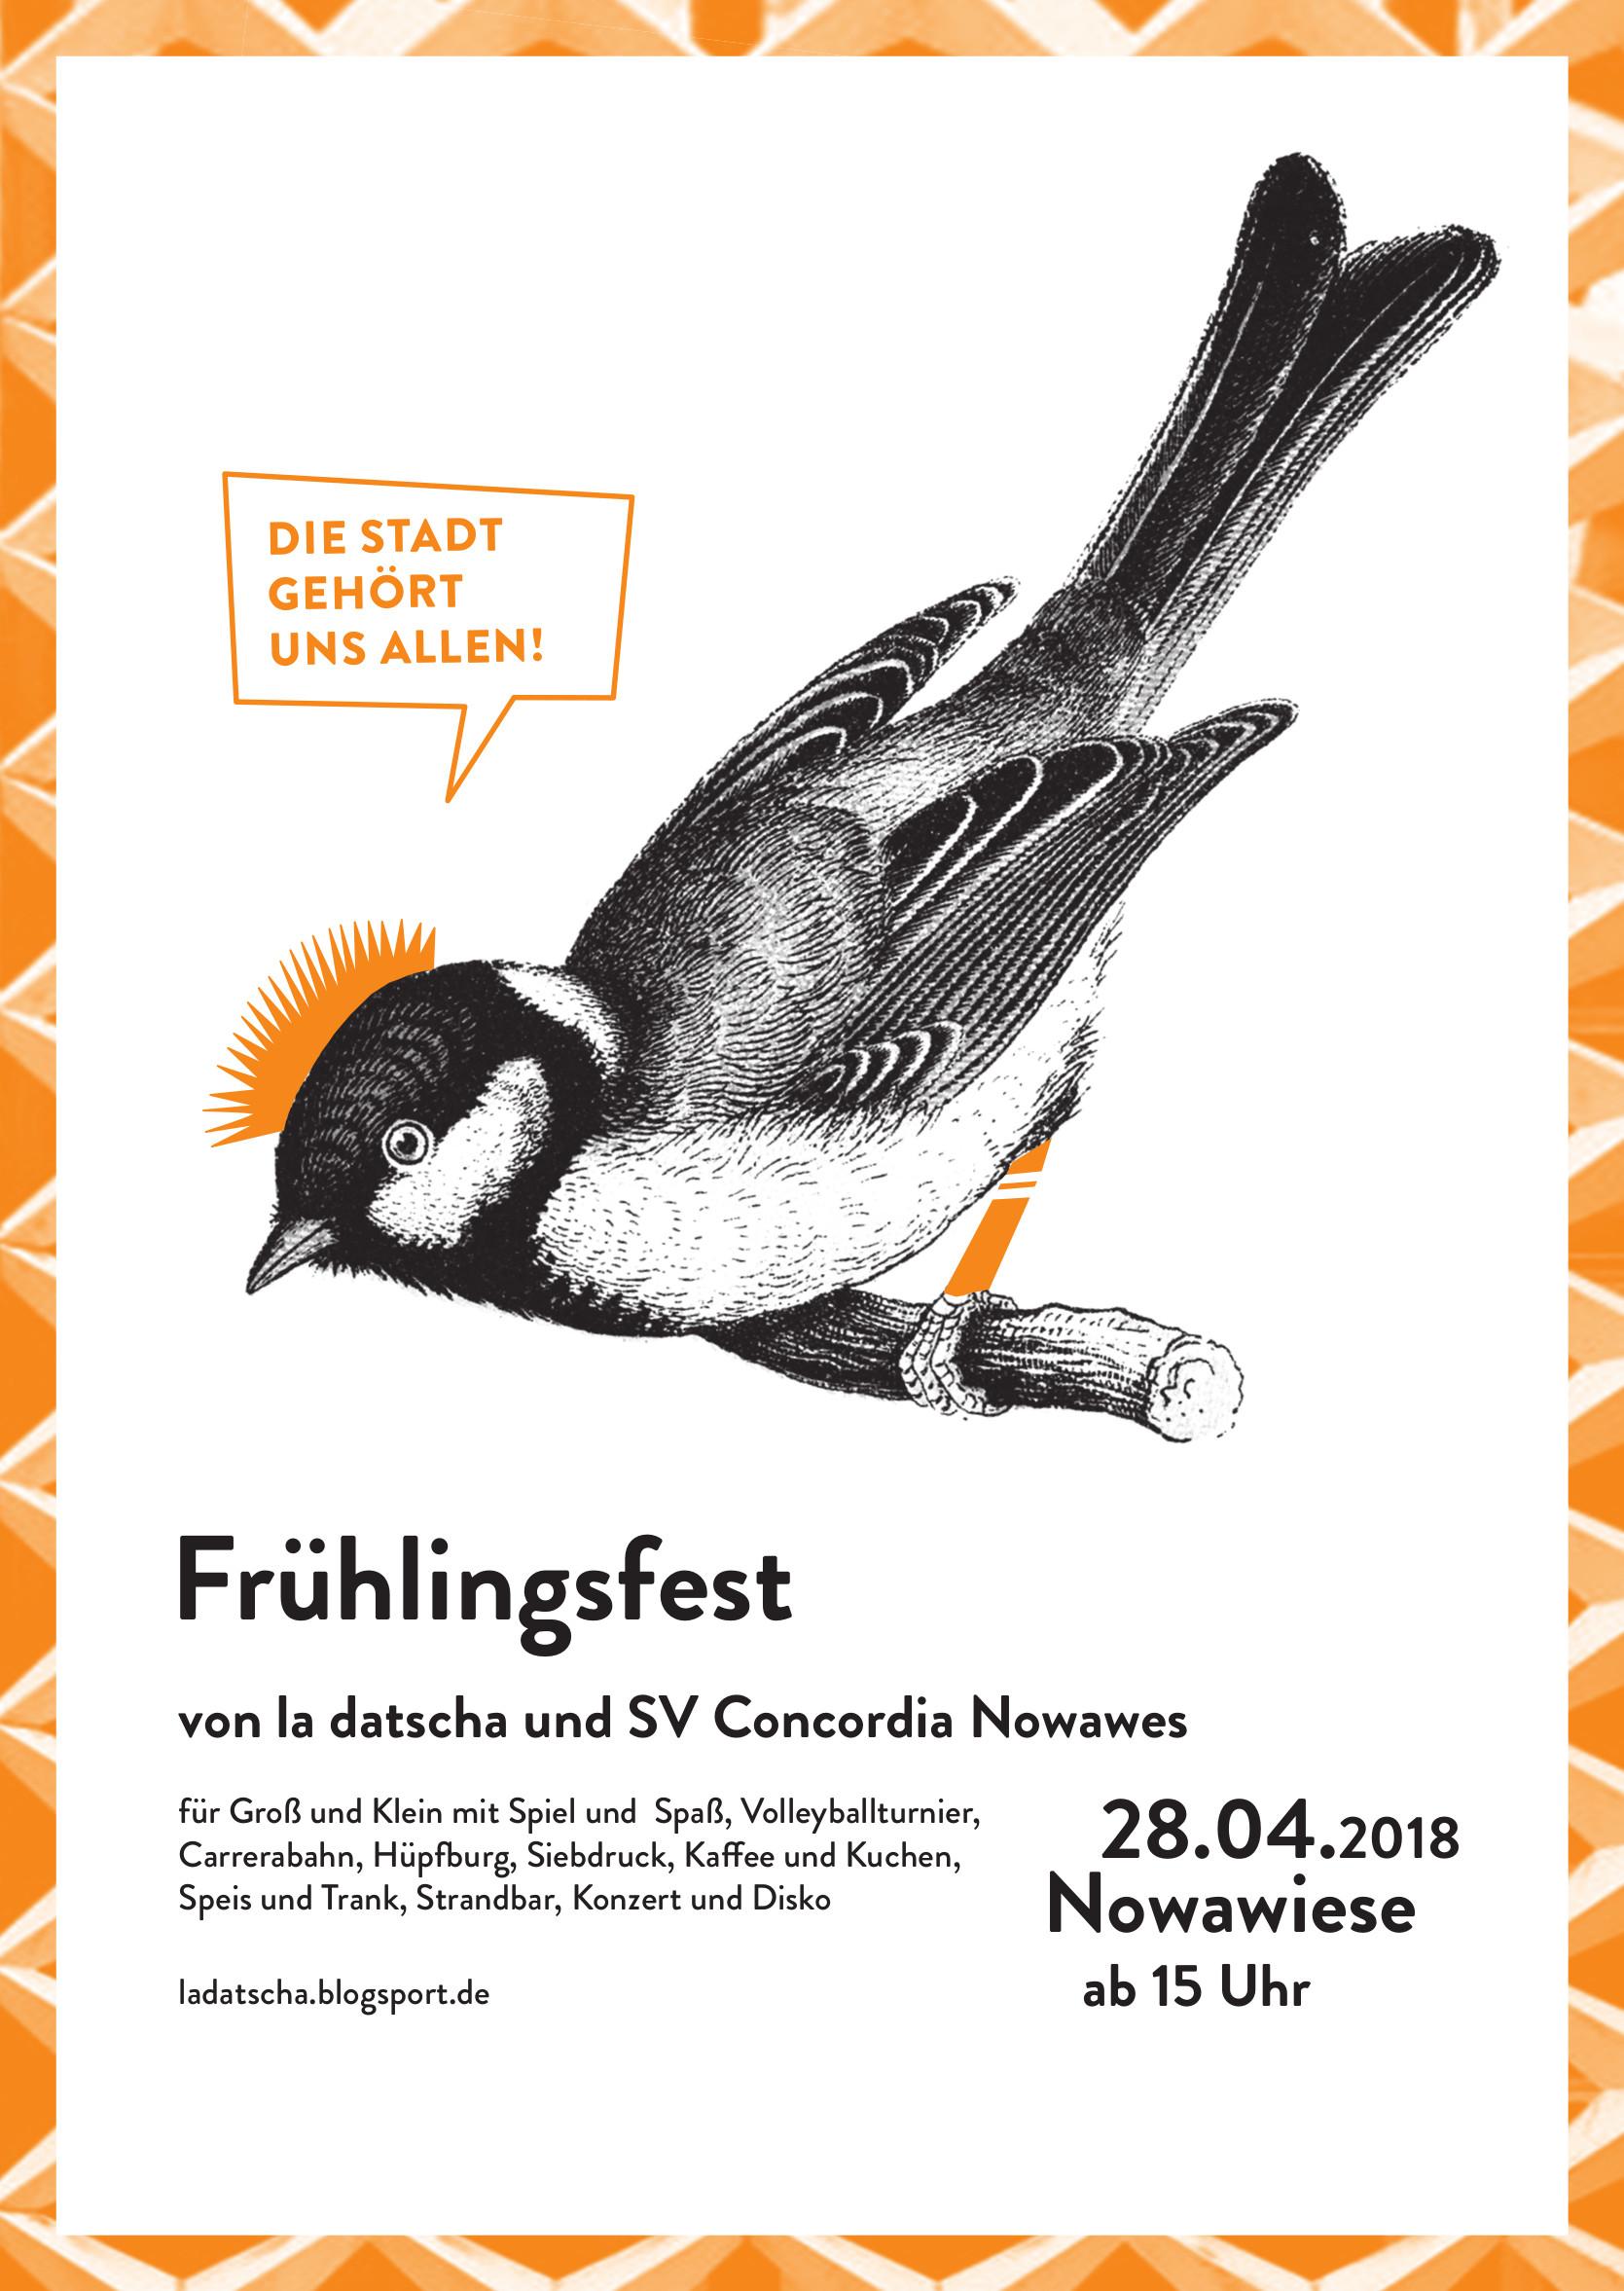 2018 Frühlingsfest la datscha